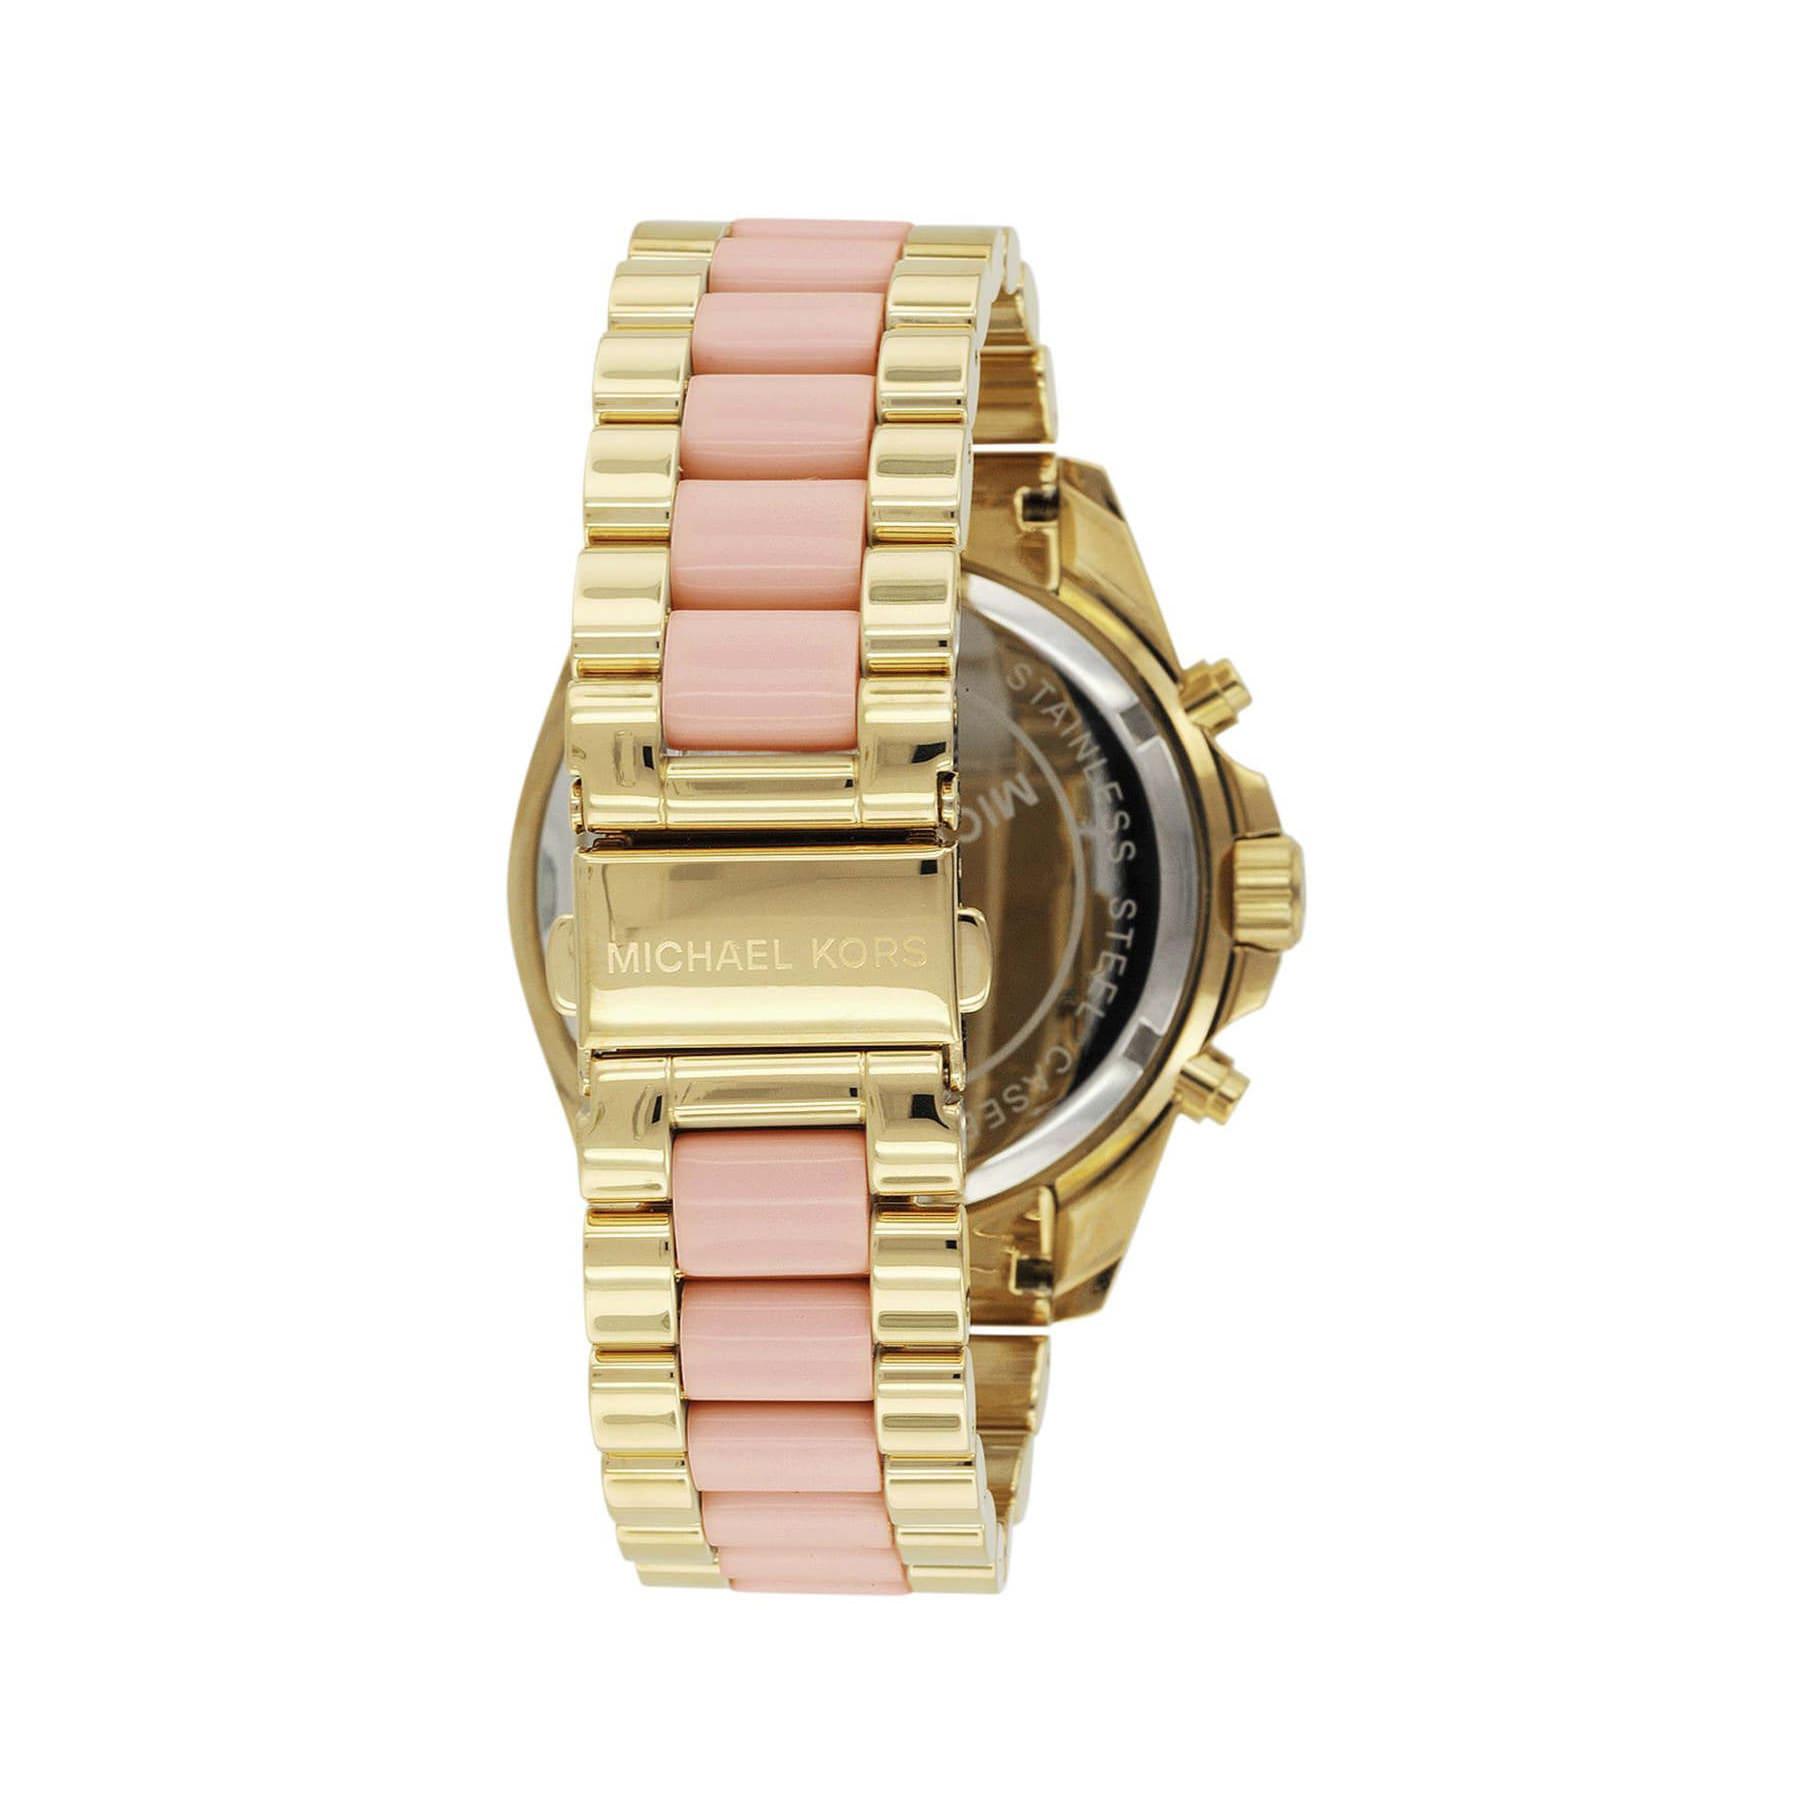 d877b509074b Michael Kors Women s MK6359 Bradshaw Chronograph Stainless Steel Watch -  Gold